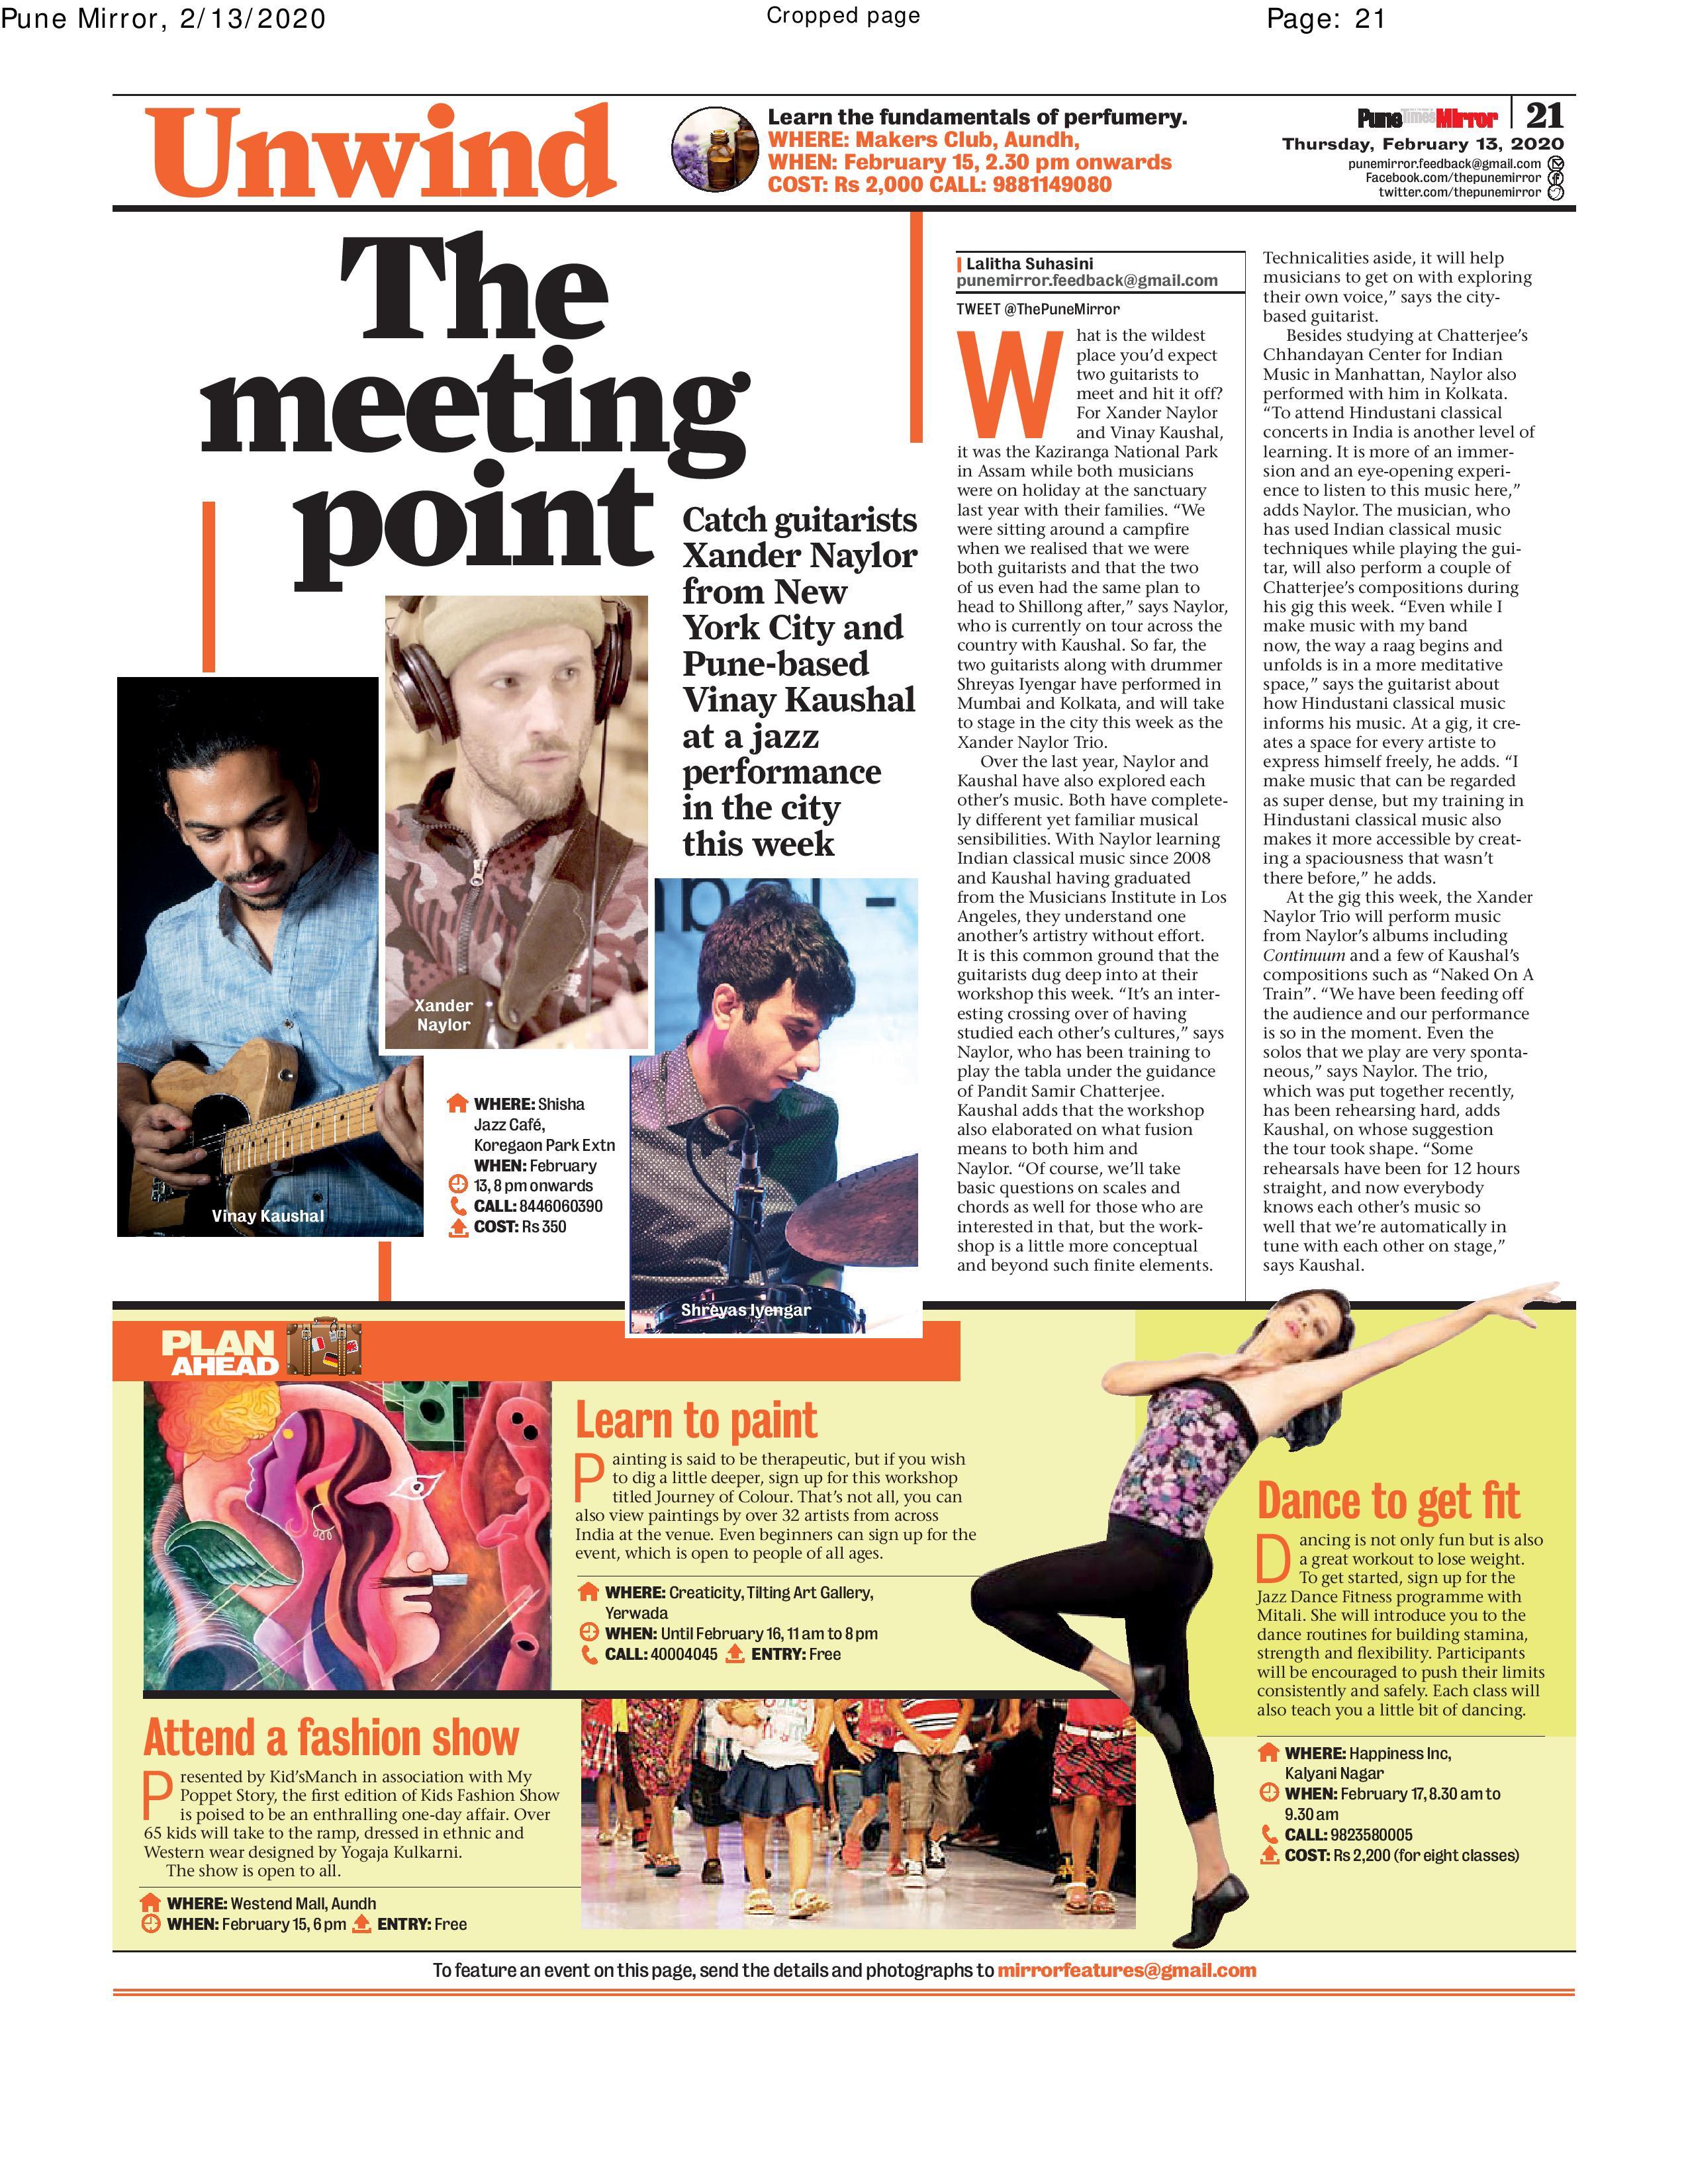 Pune Mirror 13/02/2020